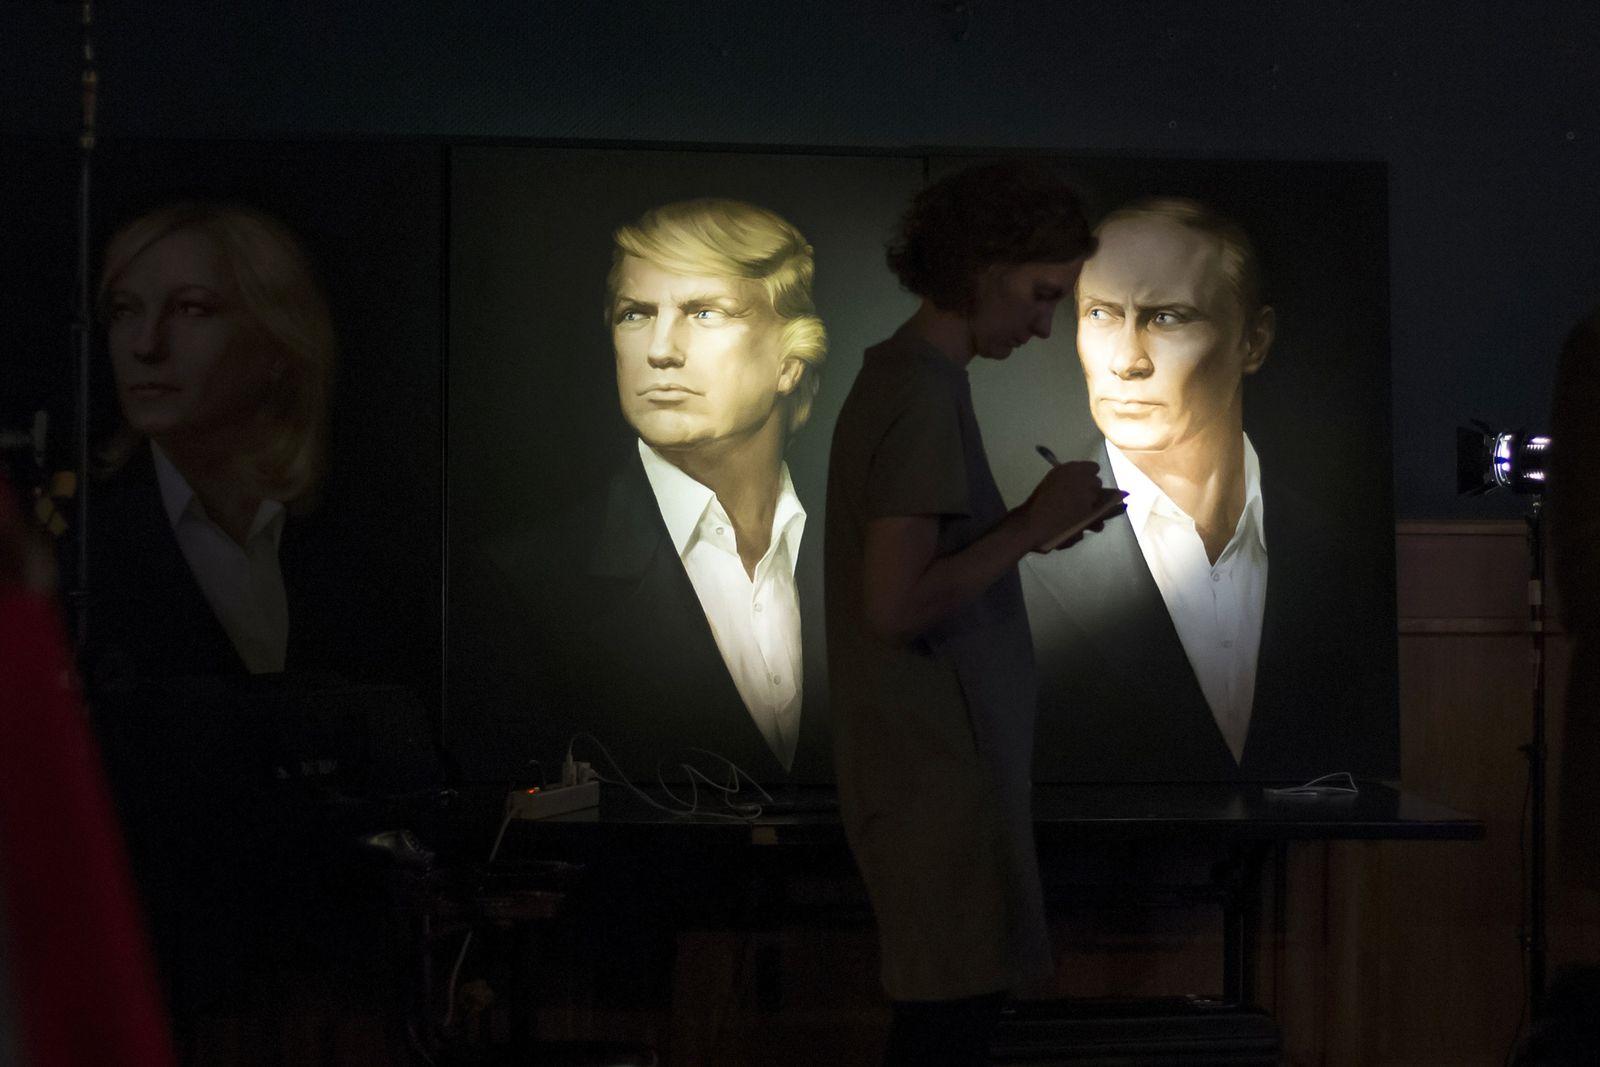 Wladimir Putin/Trump